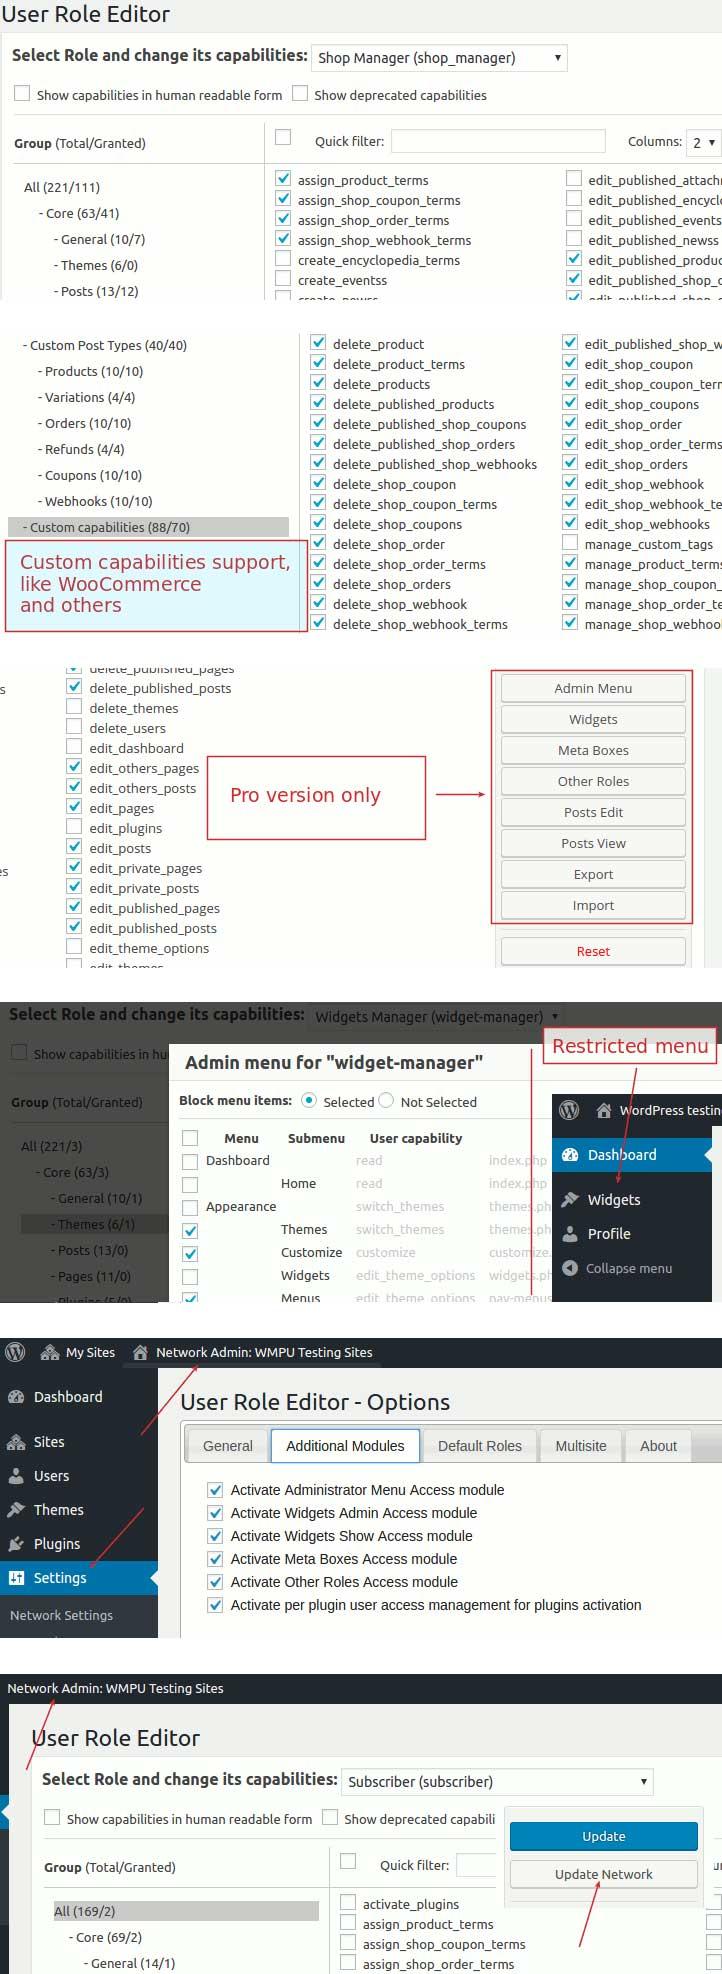 User Role Editor - WordPress User Role Plugin